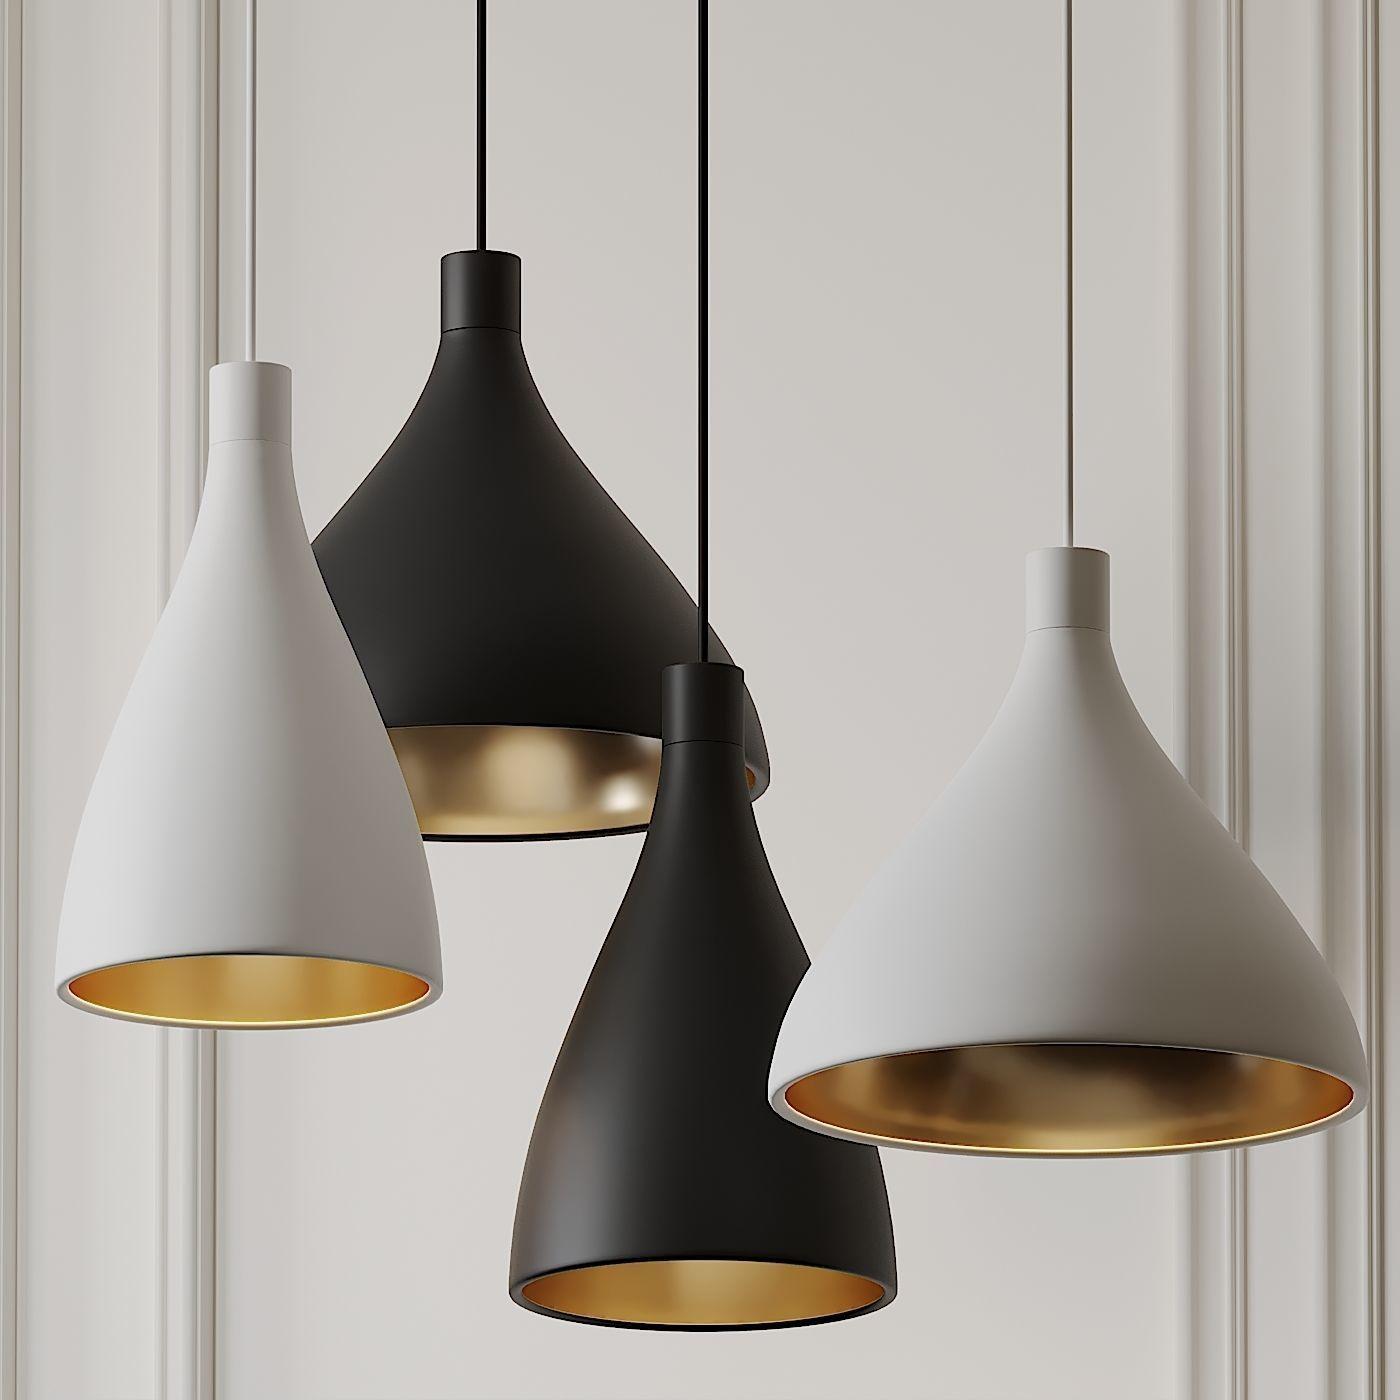 Swell Narrow and Medium Pendant Lights by Pablo Studio 3D